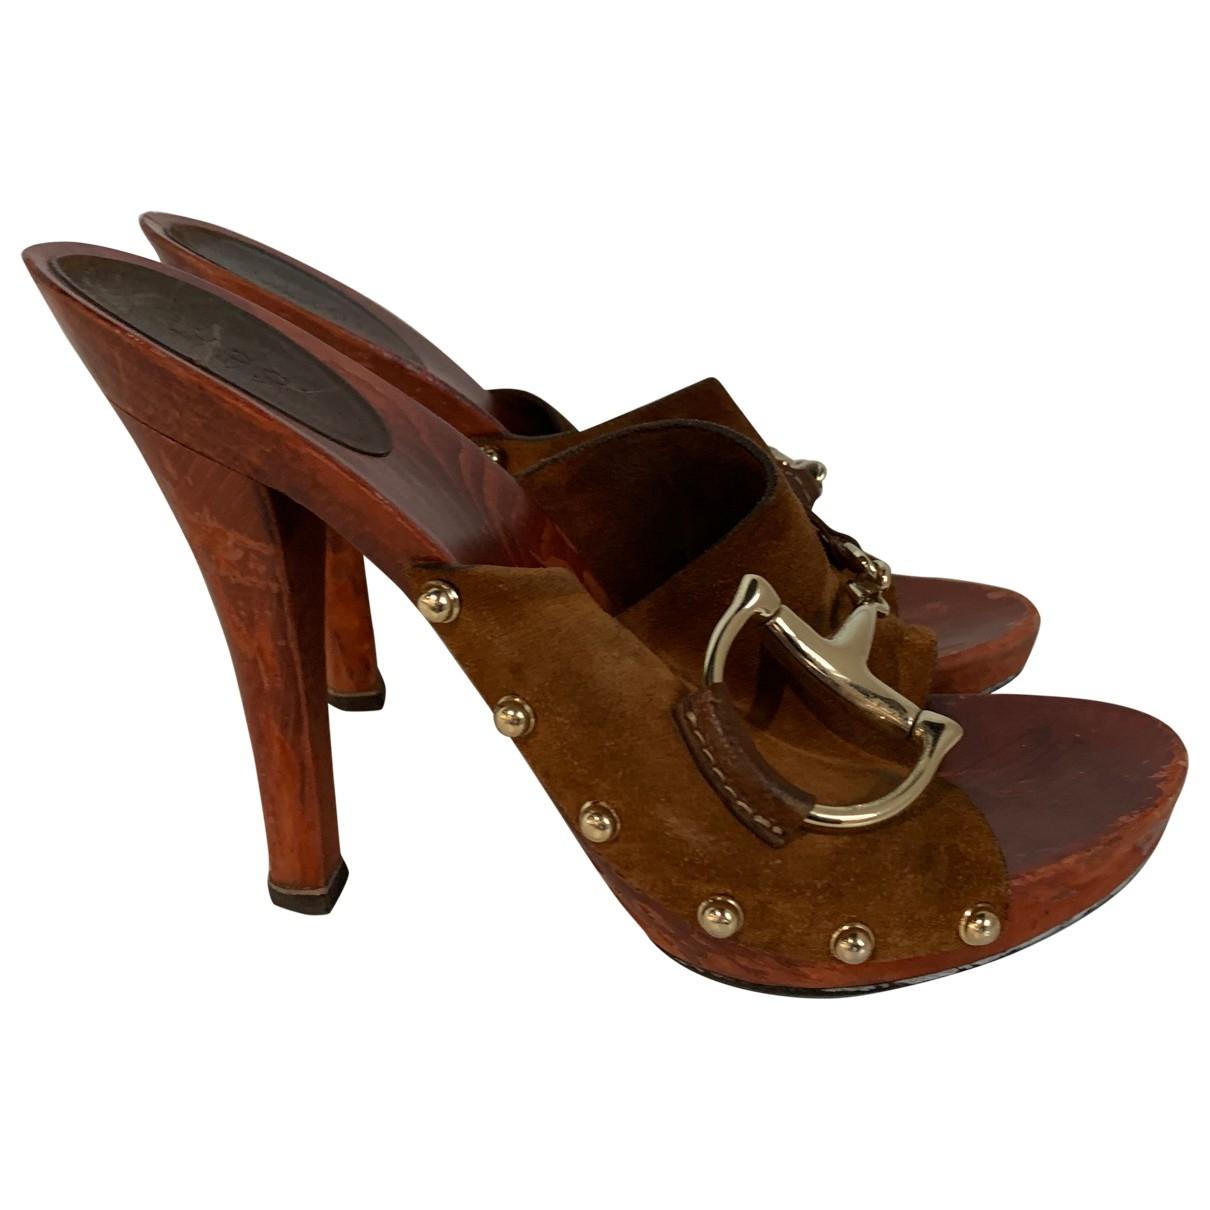 Gucci \N Brown Suede Mules & Clogs for Women 38.5 EU